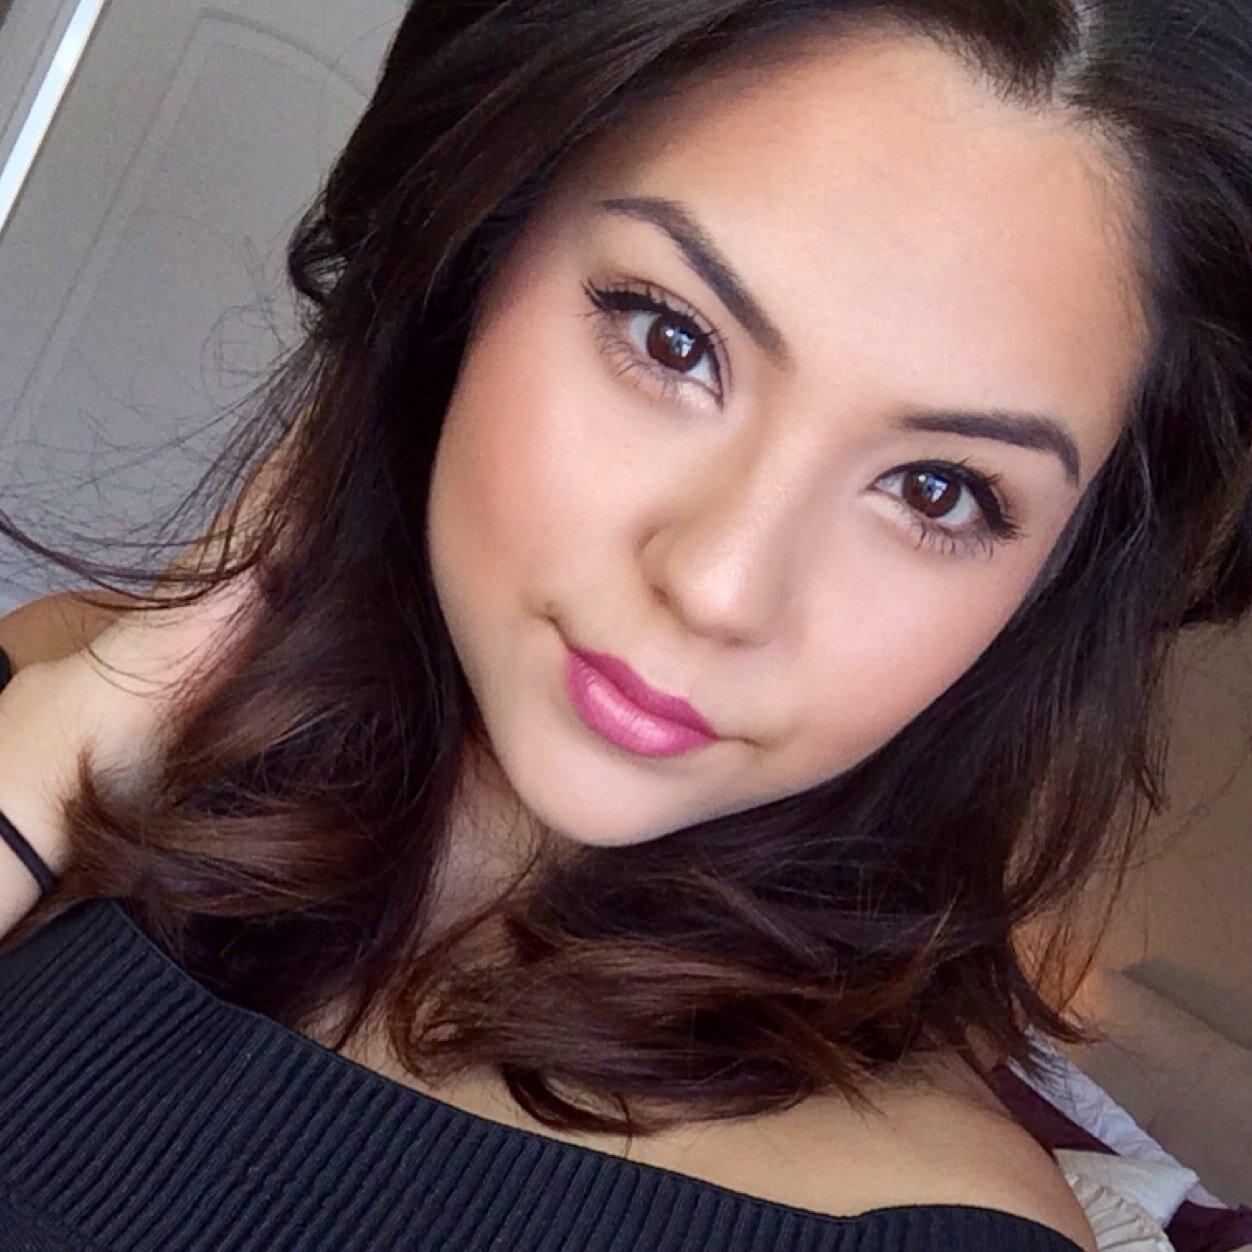 Kayla Marie